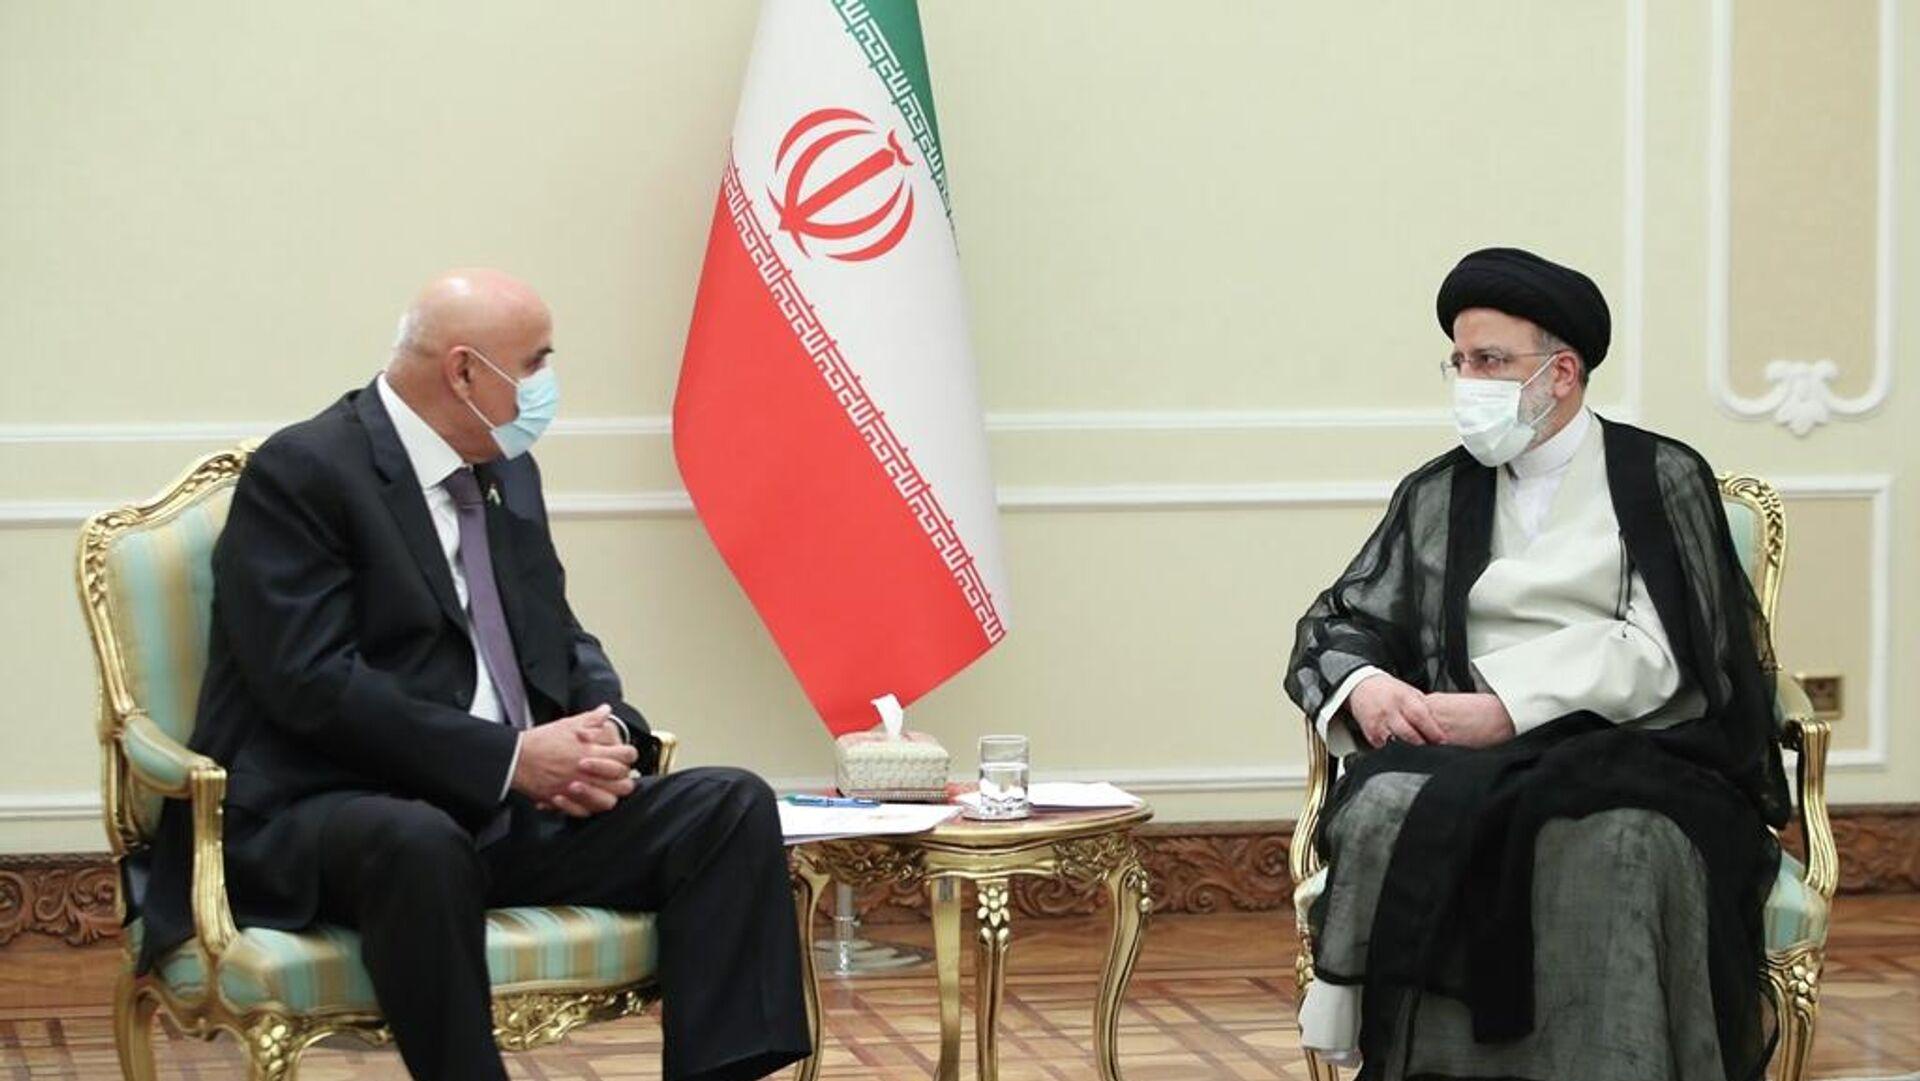 Спикер нижней палаты Парламента Таджикистана Махмадтоир Зокирзода и президент Ирана Ибрахим Раиси - Sputnik Таджикистан, 1920, 05.08.2021